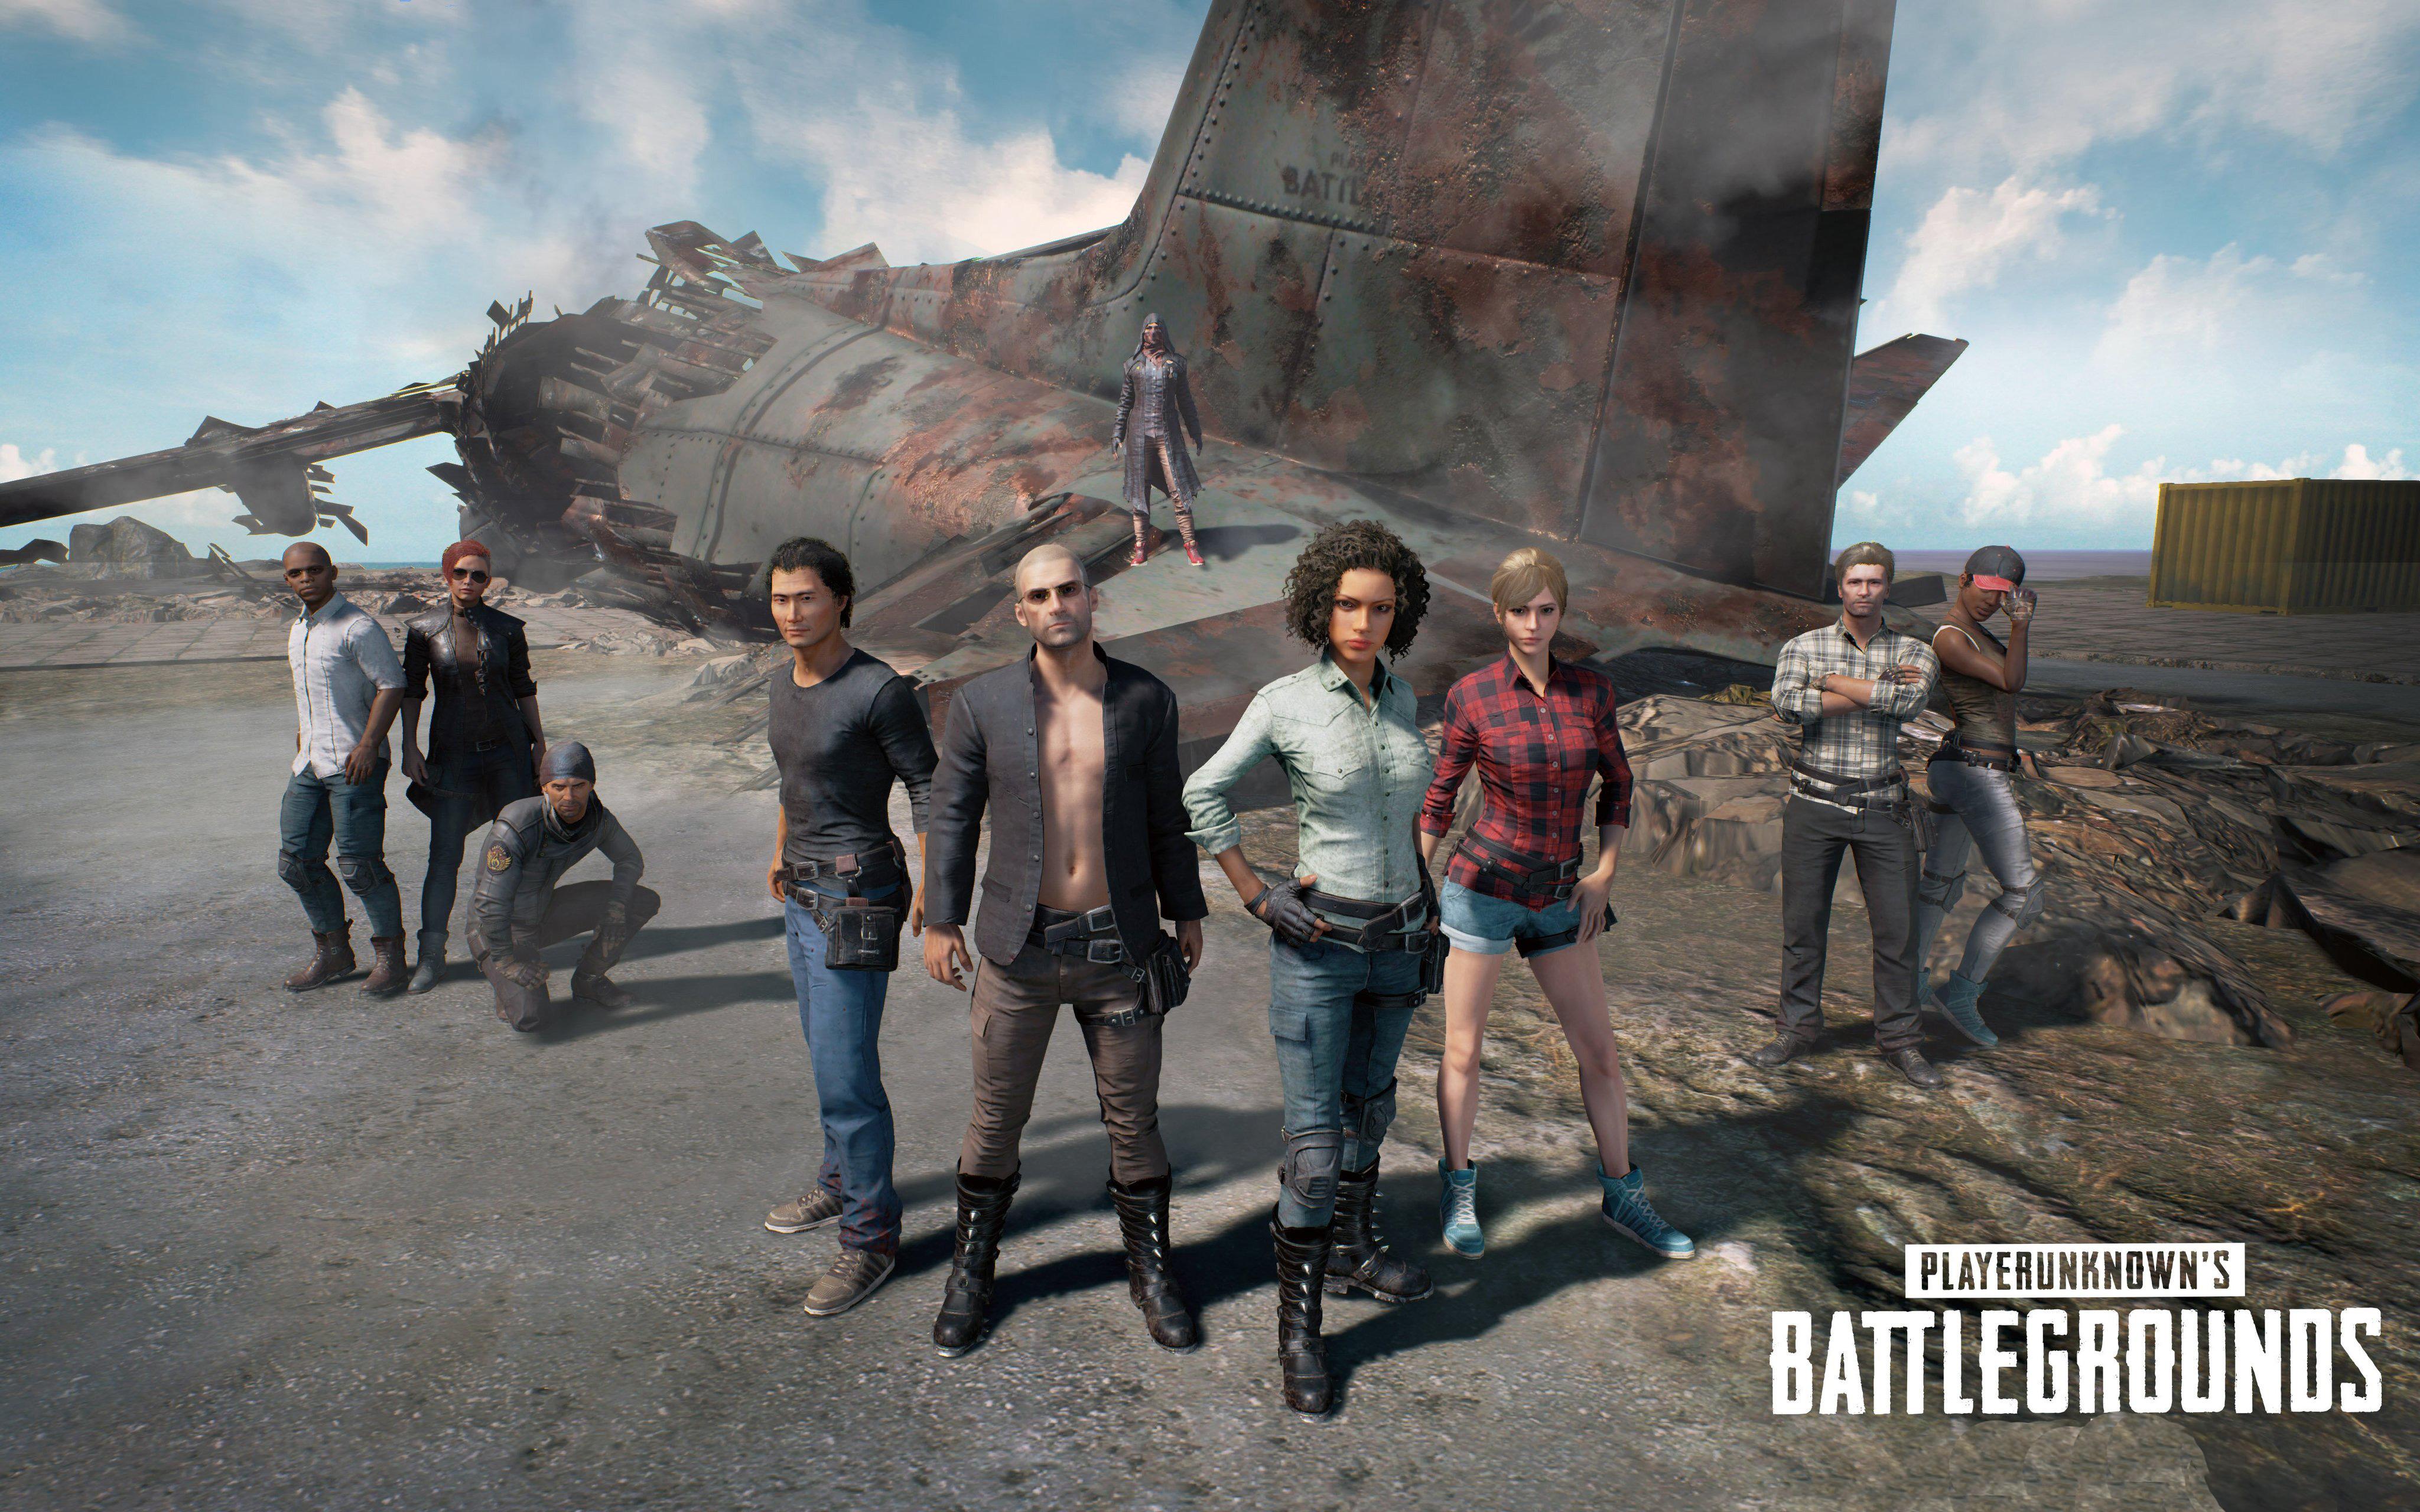 1920x1080 PlayerUnknowns Battlegrounds 2017 Game Laptop